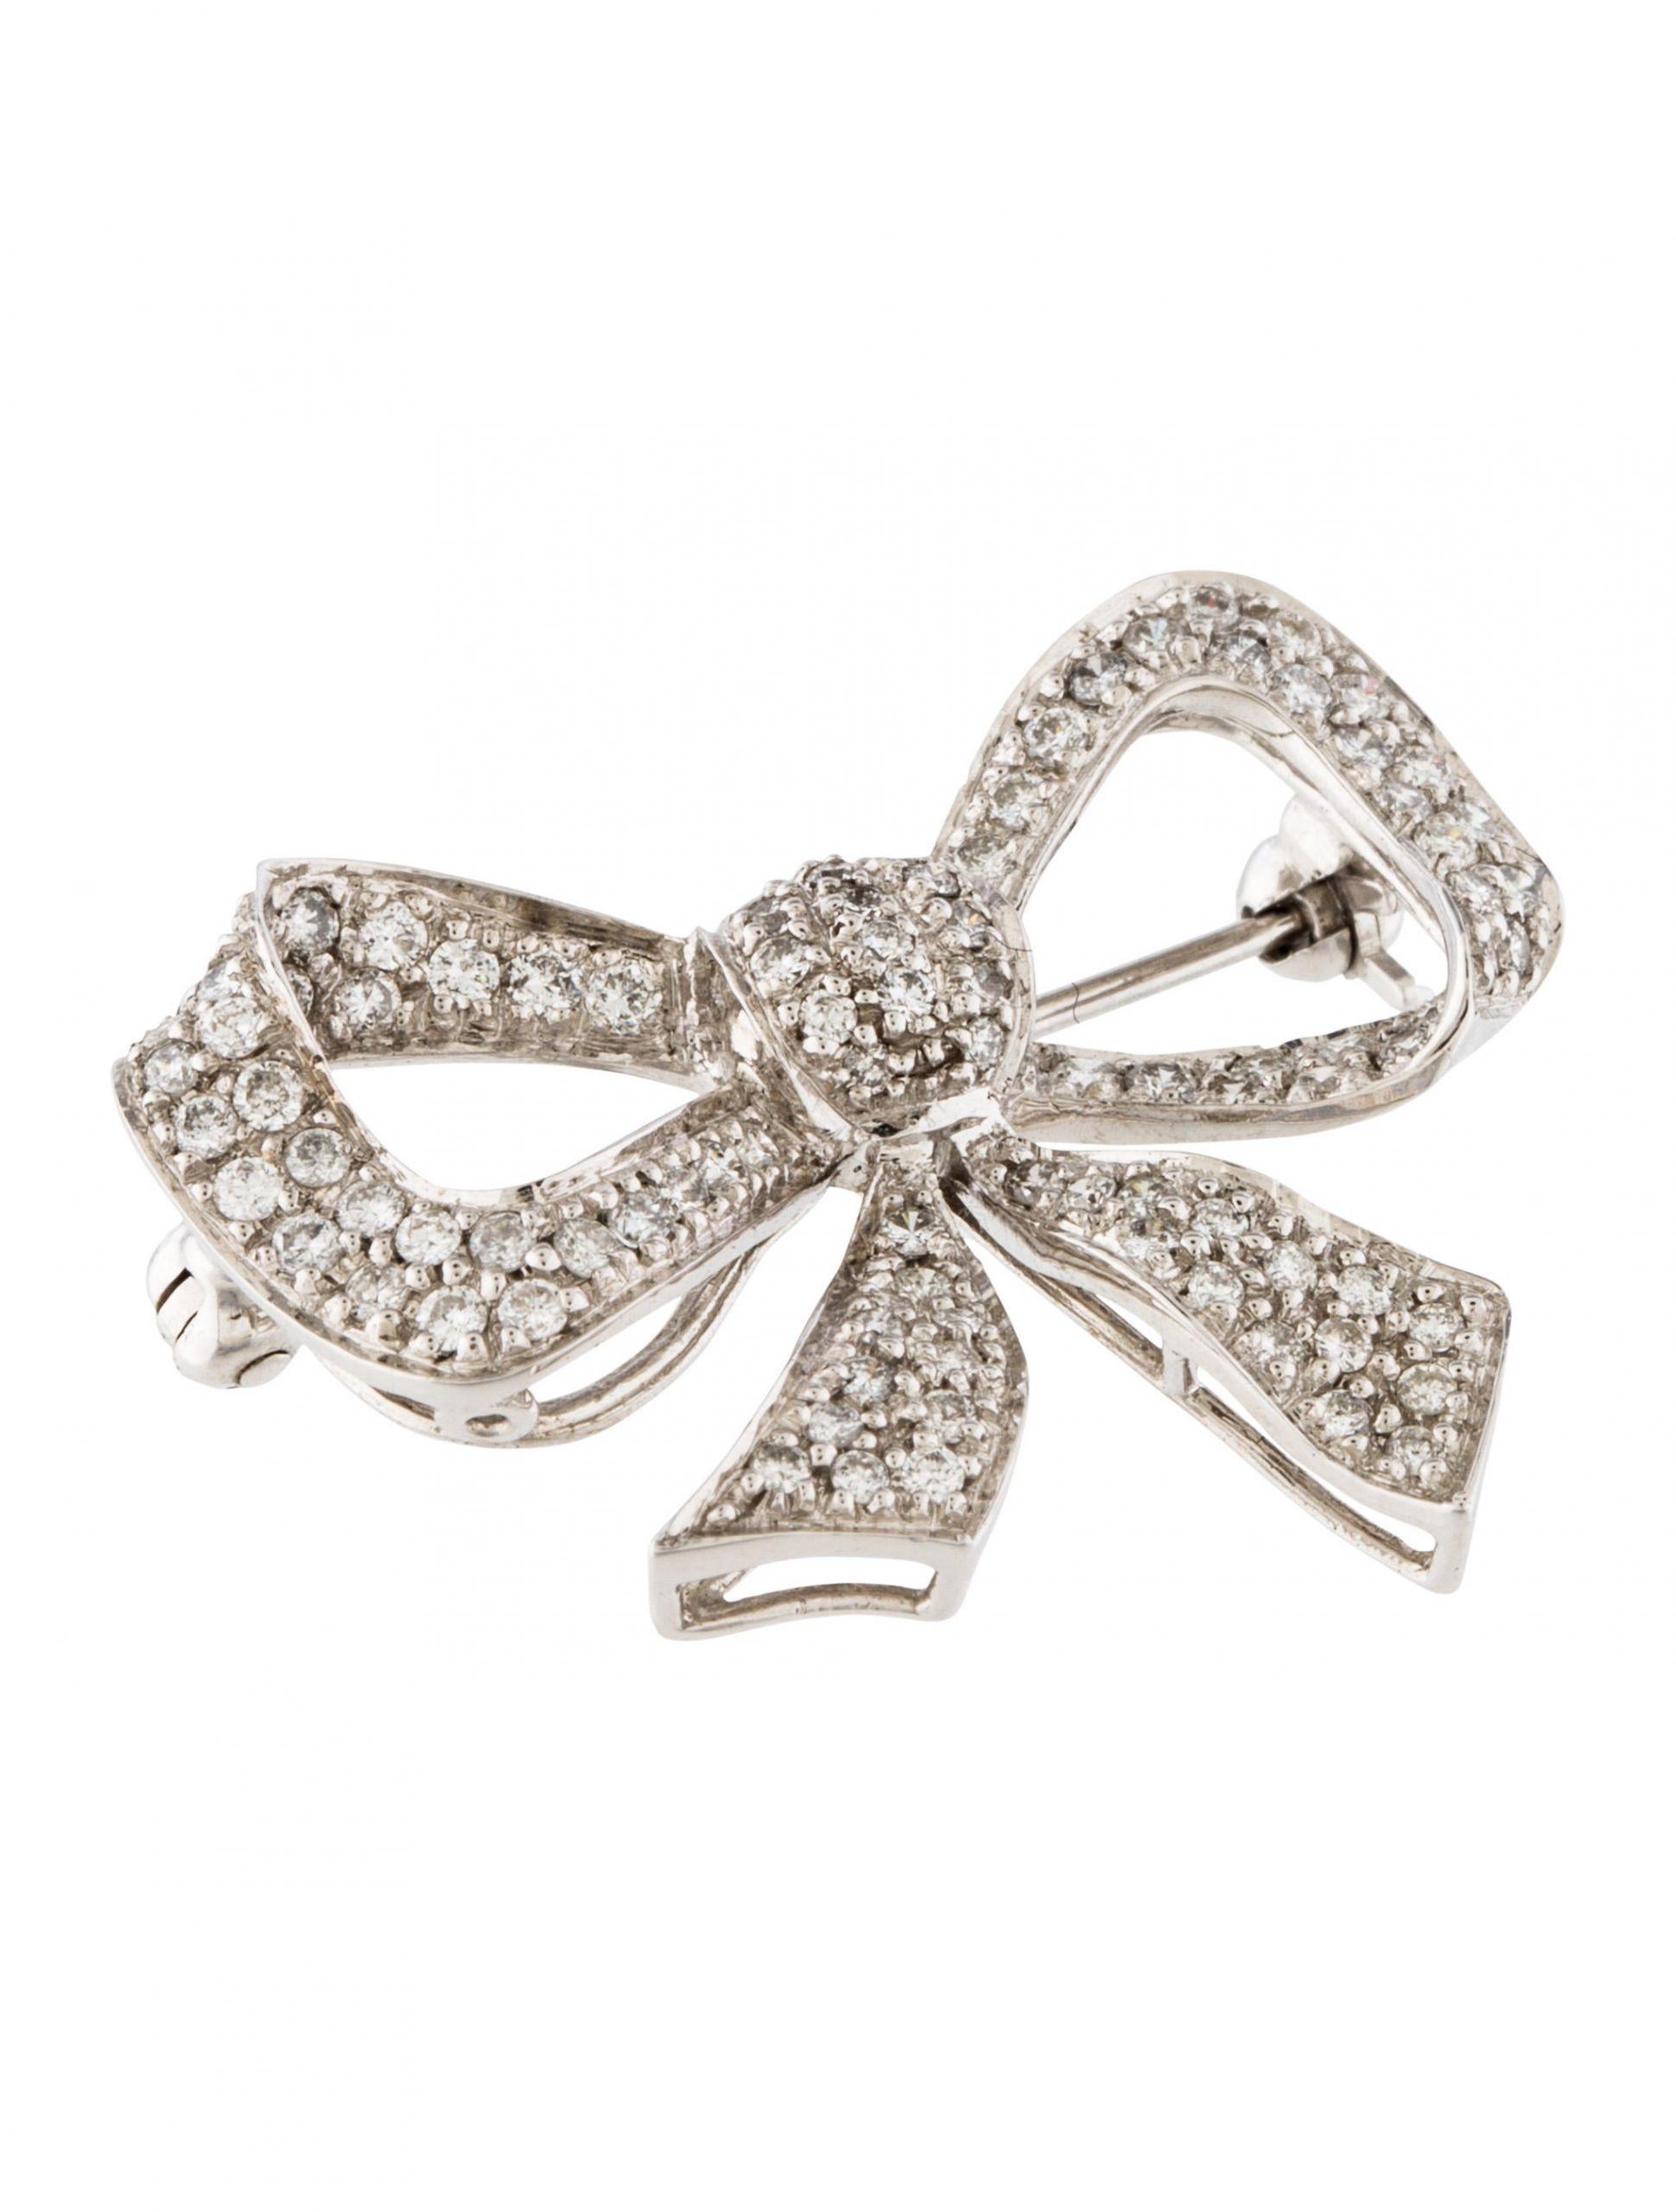 Bow Brooches  14K Diamond Bow Brooch Pin Brooches BROOC